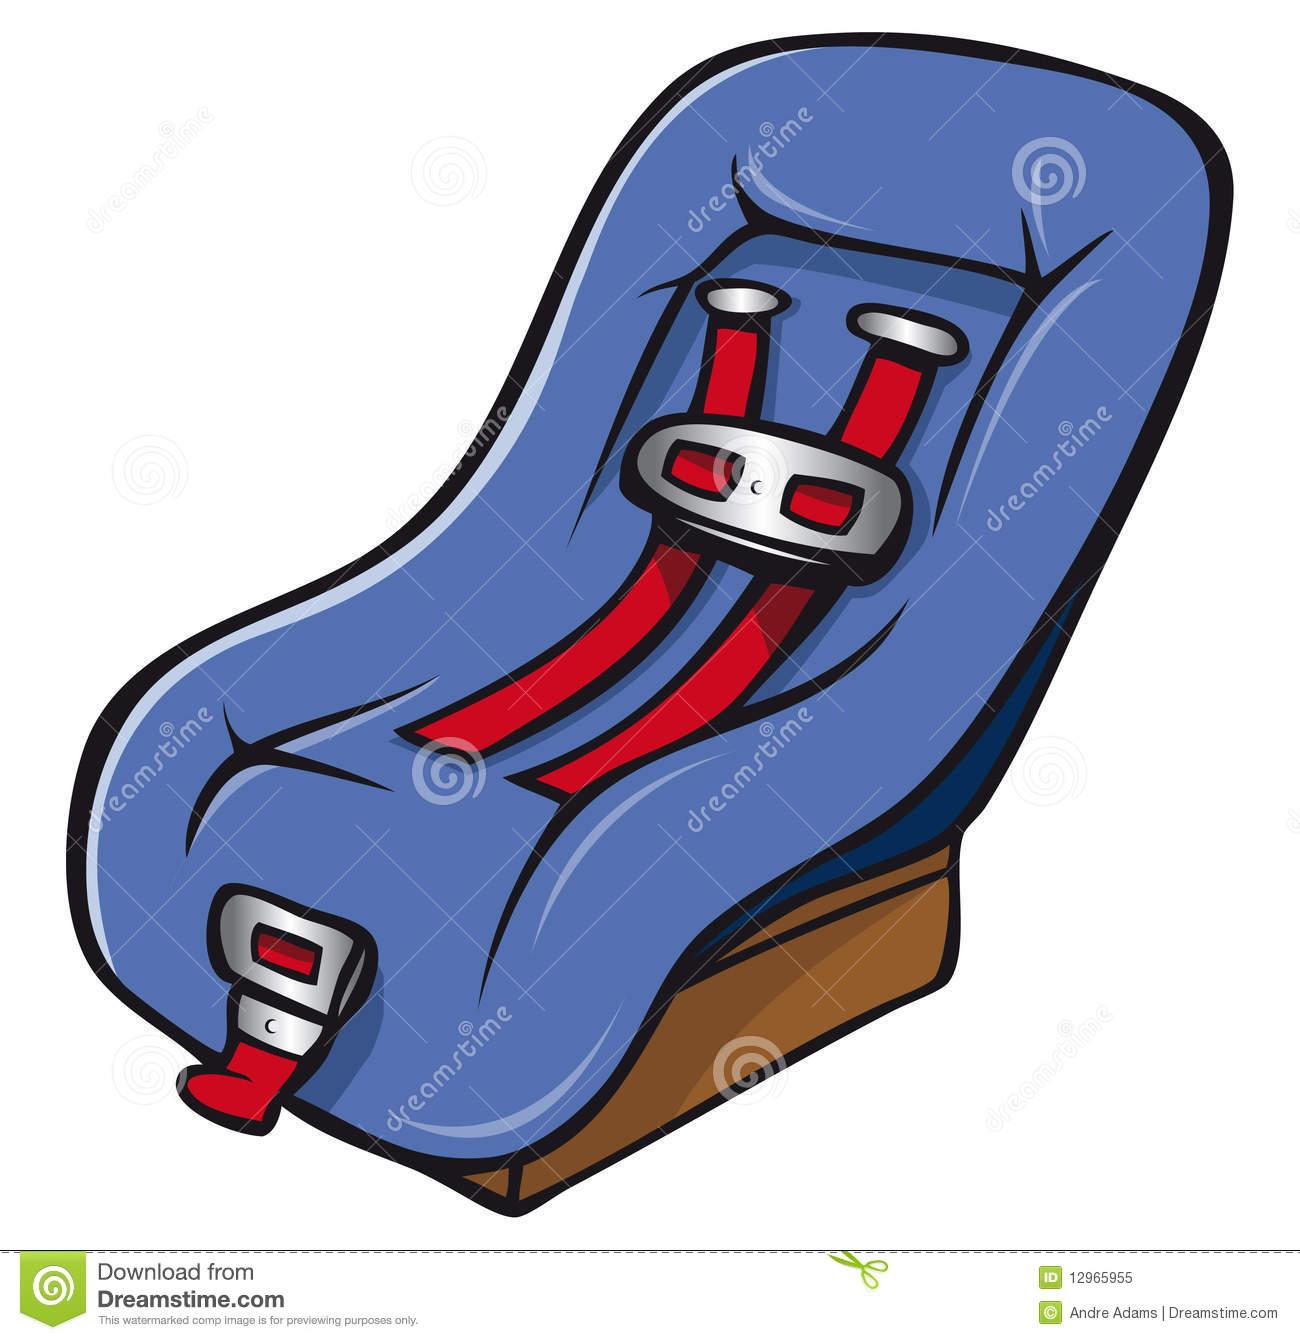 car seat clipart - photo #8